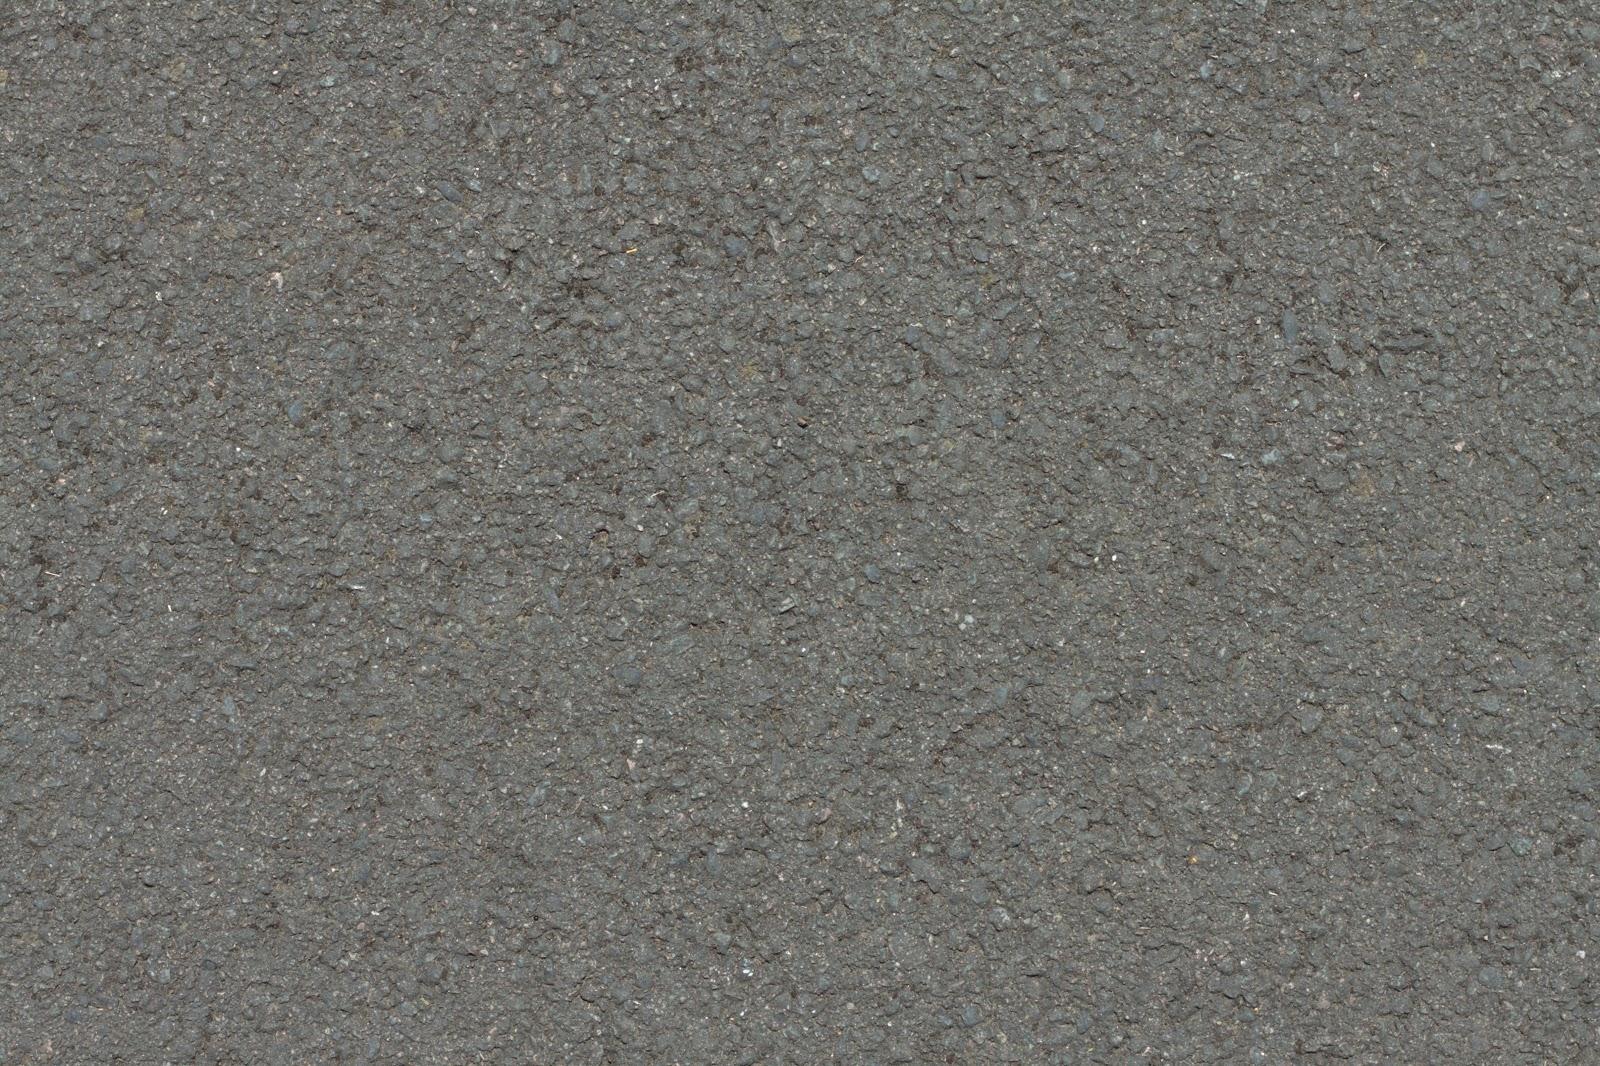 (ASPHALT 1) tarmac road tar texture